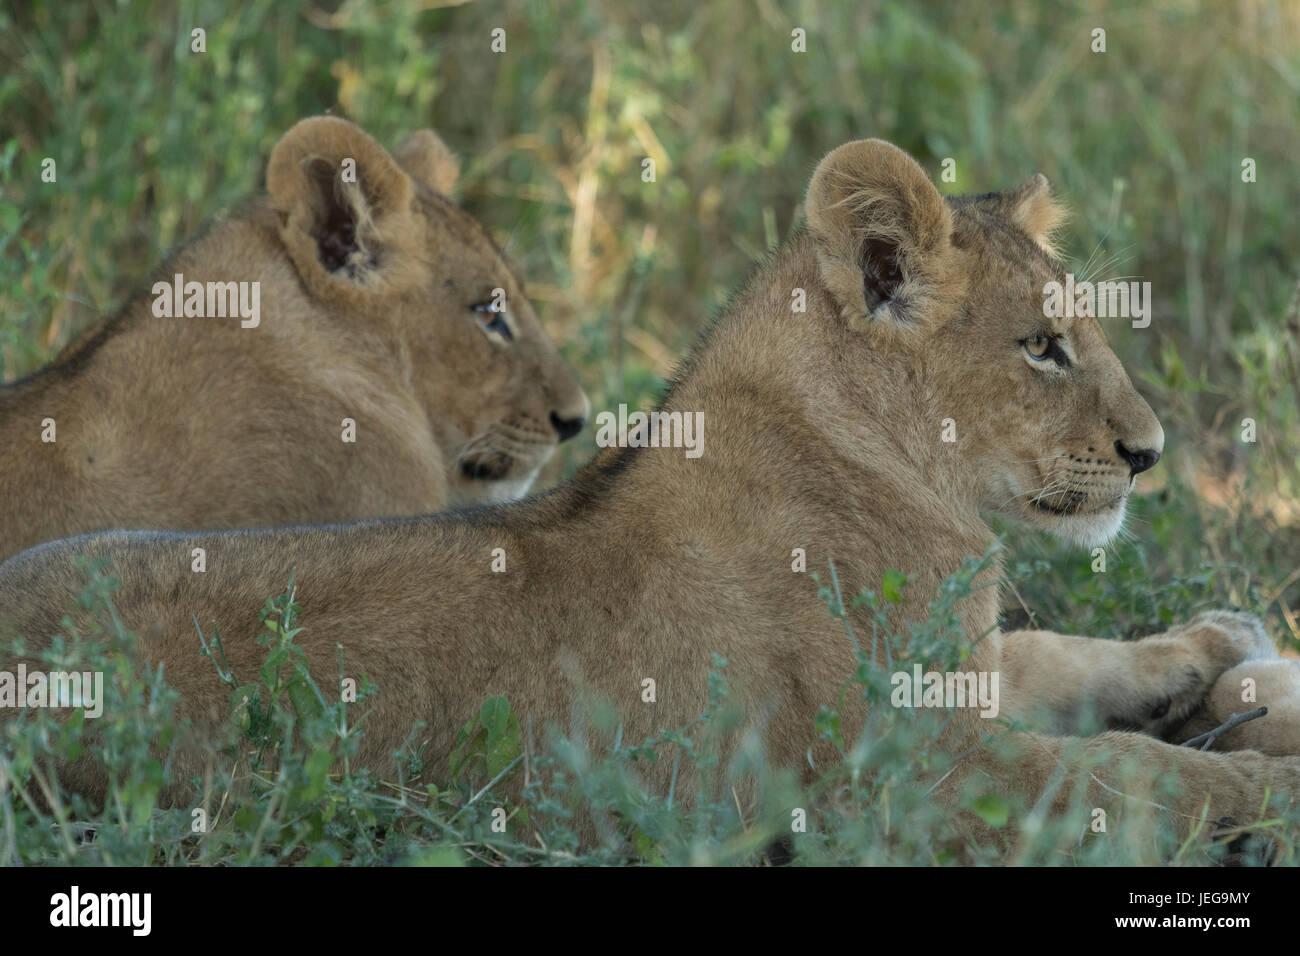 Two lionesses (Panthera leo) in the Okavango Delta Botswana - Stock Image